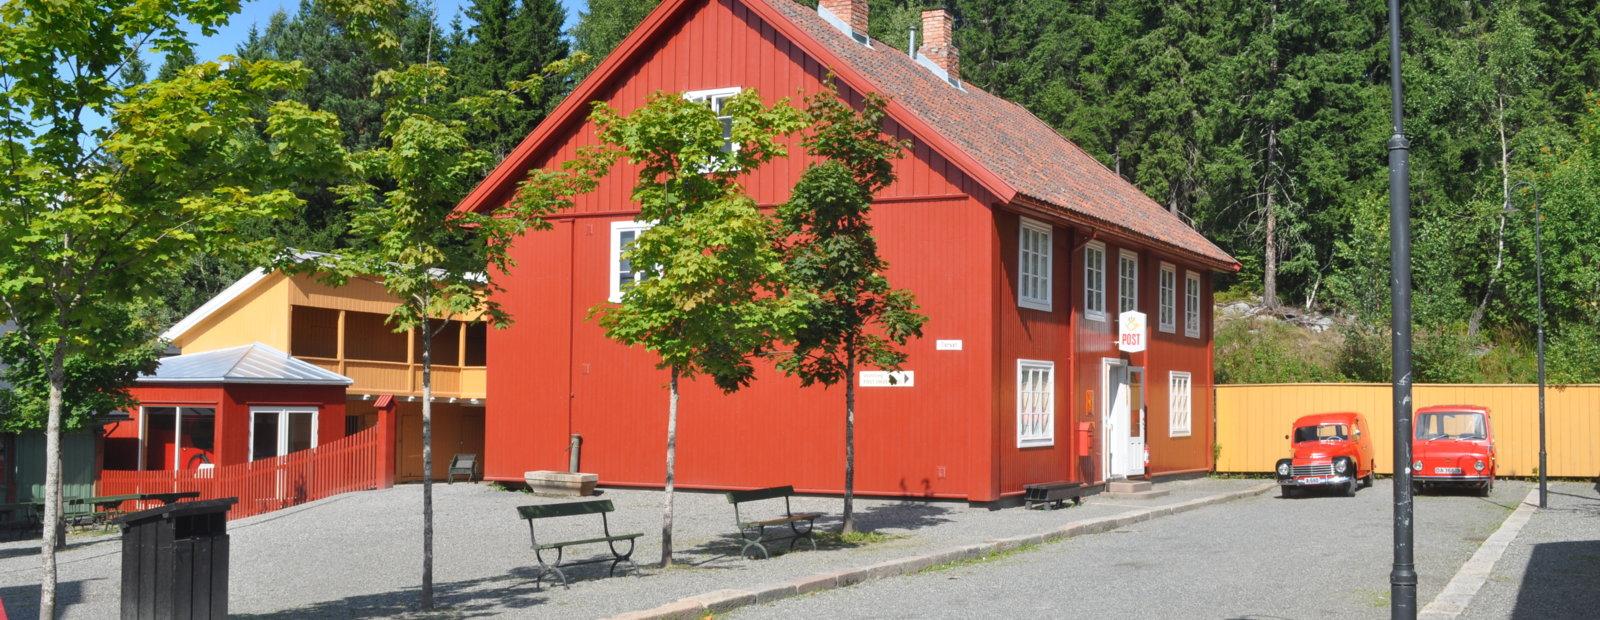 Norges Postmuseum, Maihaugen, Lillehammer